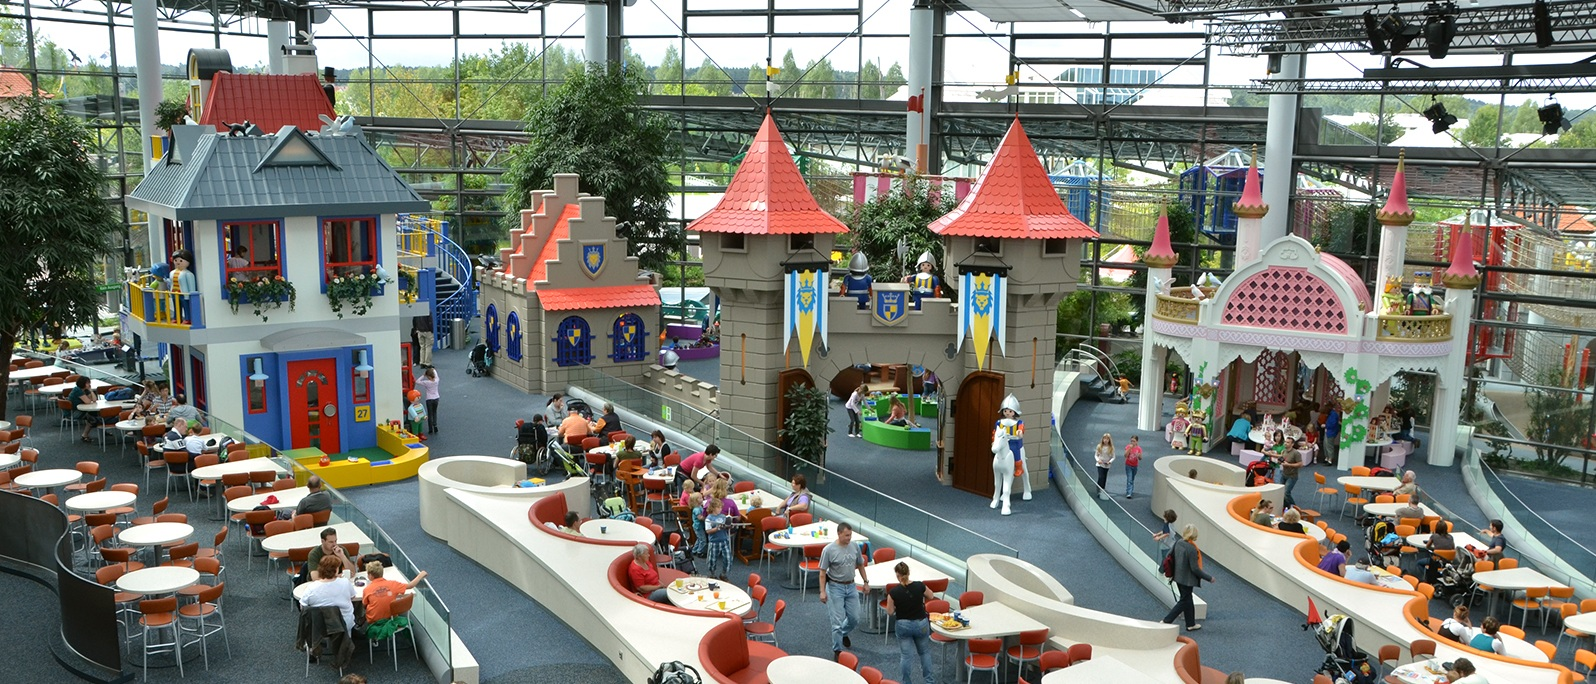 Playmobil fun park geburtstag